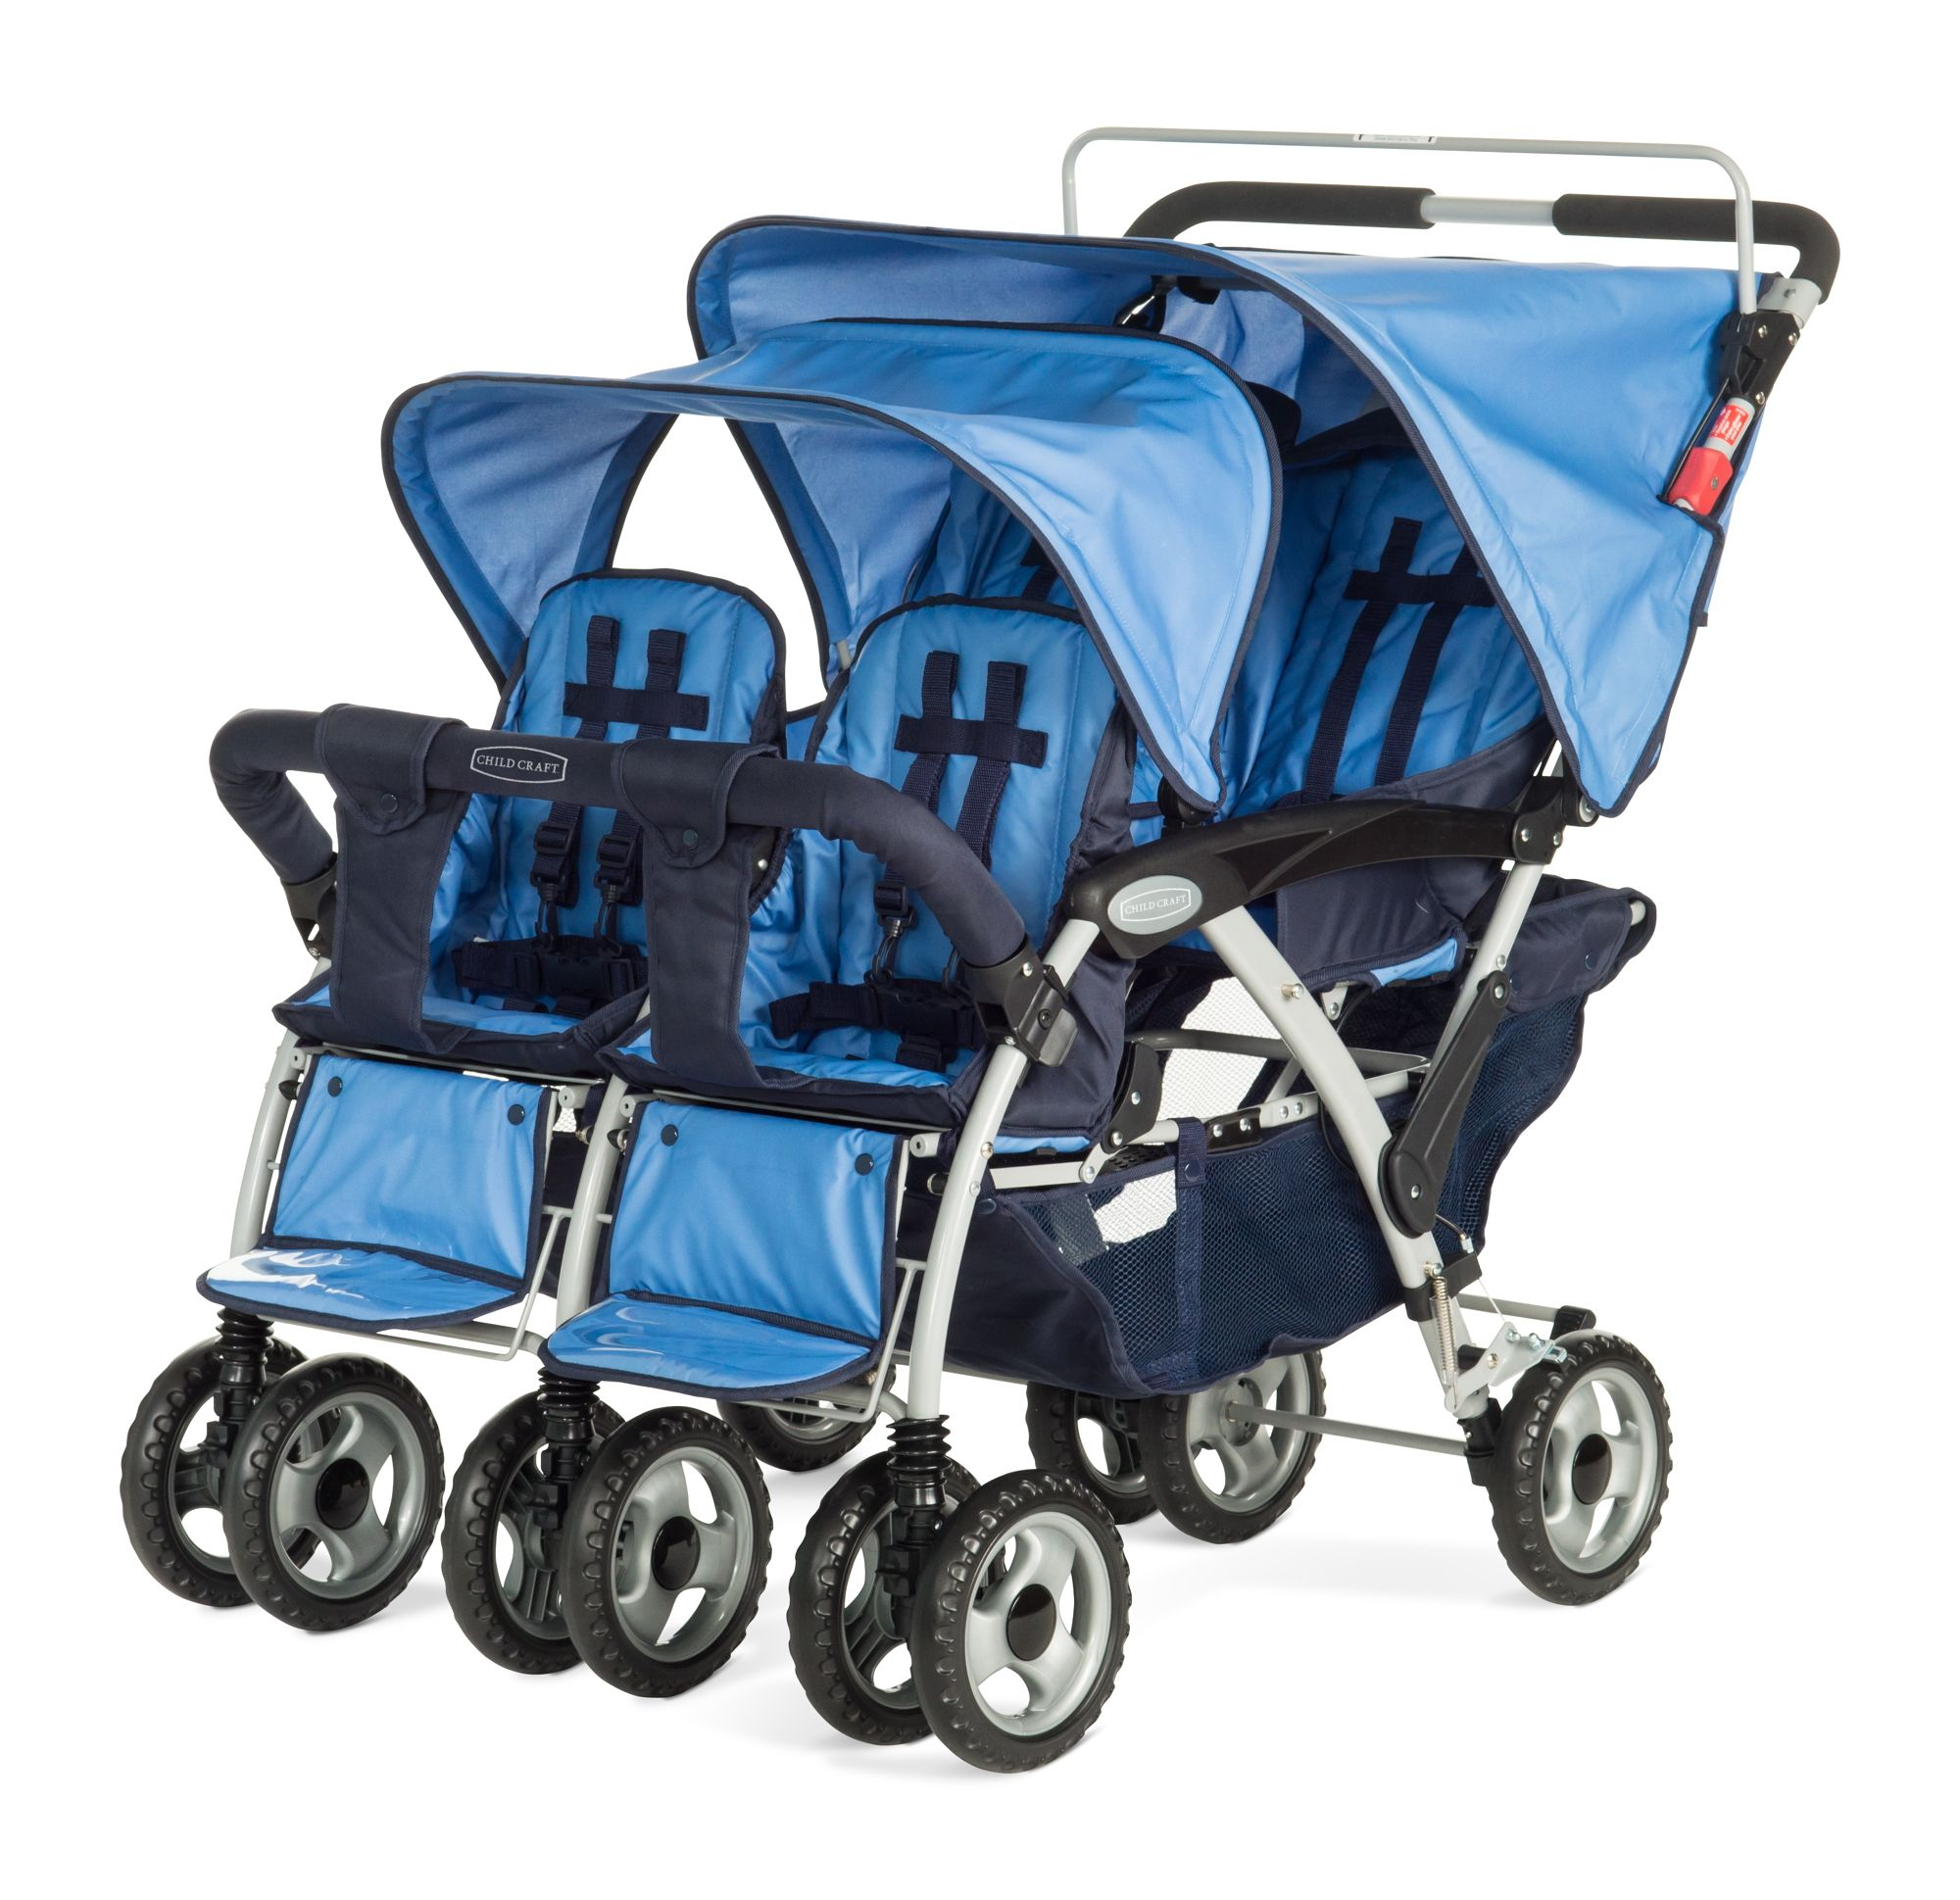 Child Craft Sport Quad Stroller Blue, Baby Strollers